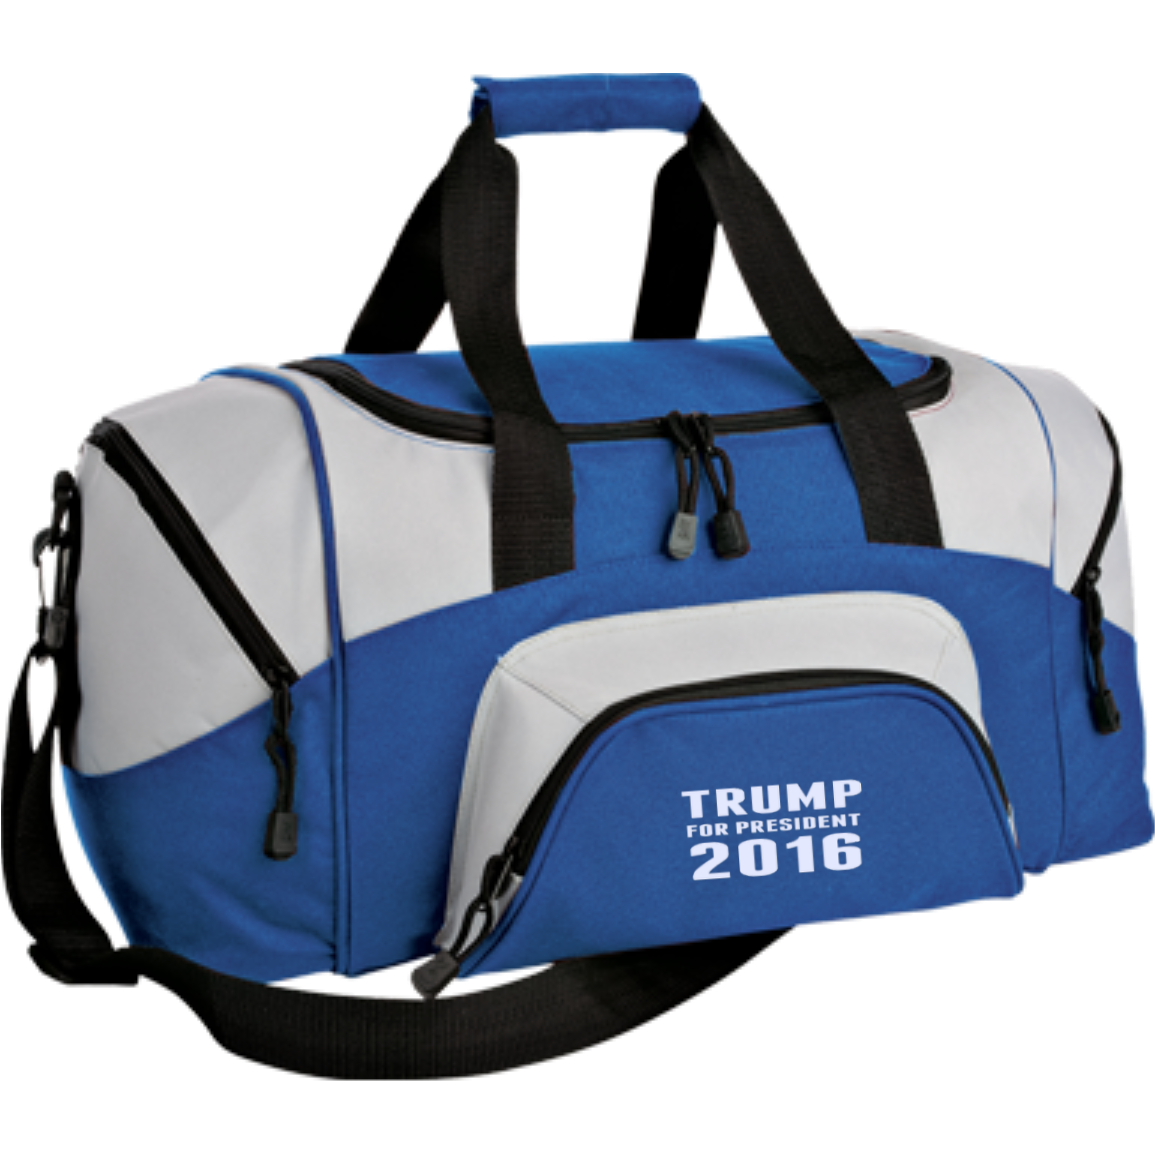 f6294febce Trump 2016 Small Colorblock Sport Duffel Bag